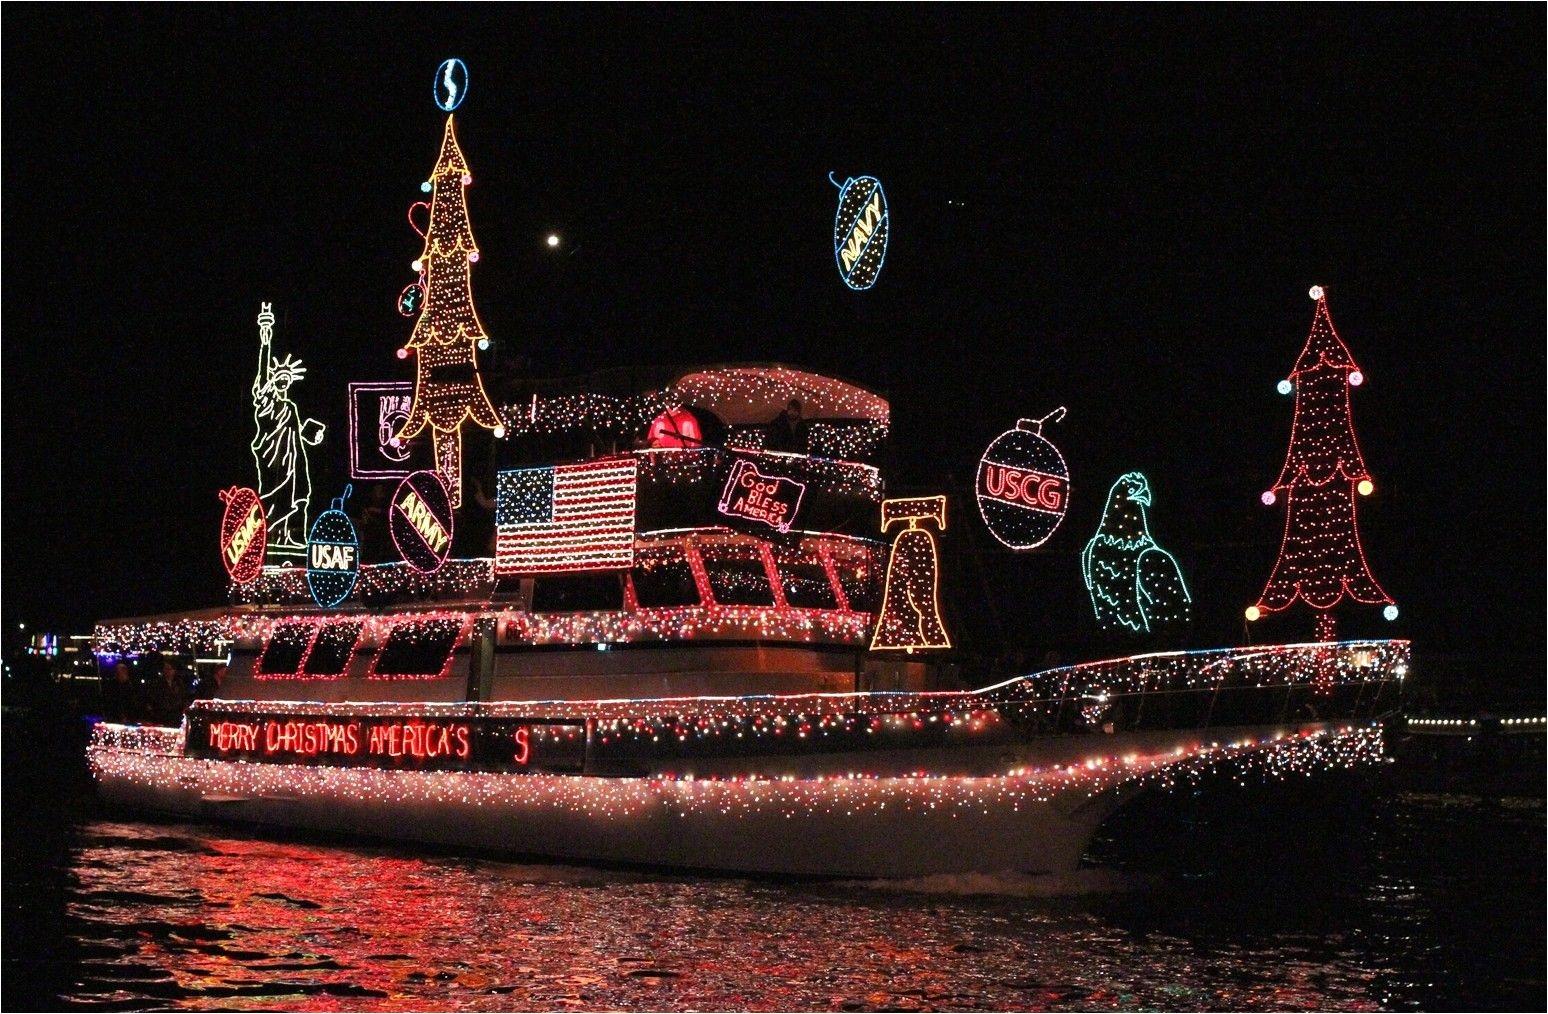 christmas boat paradenewport beach photo by jim collins